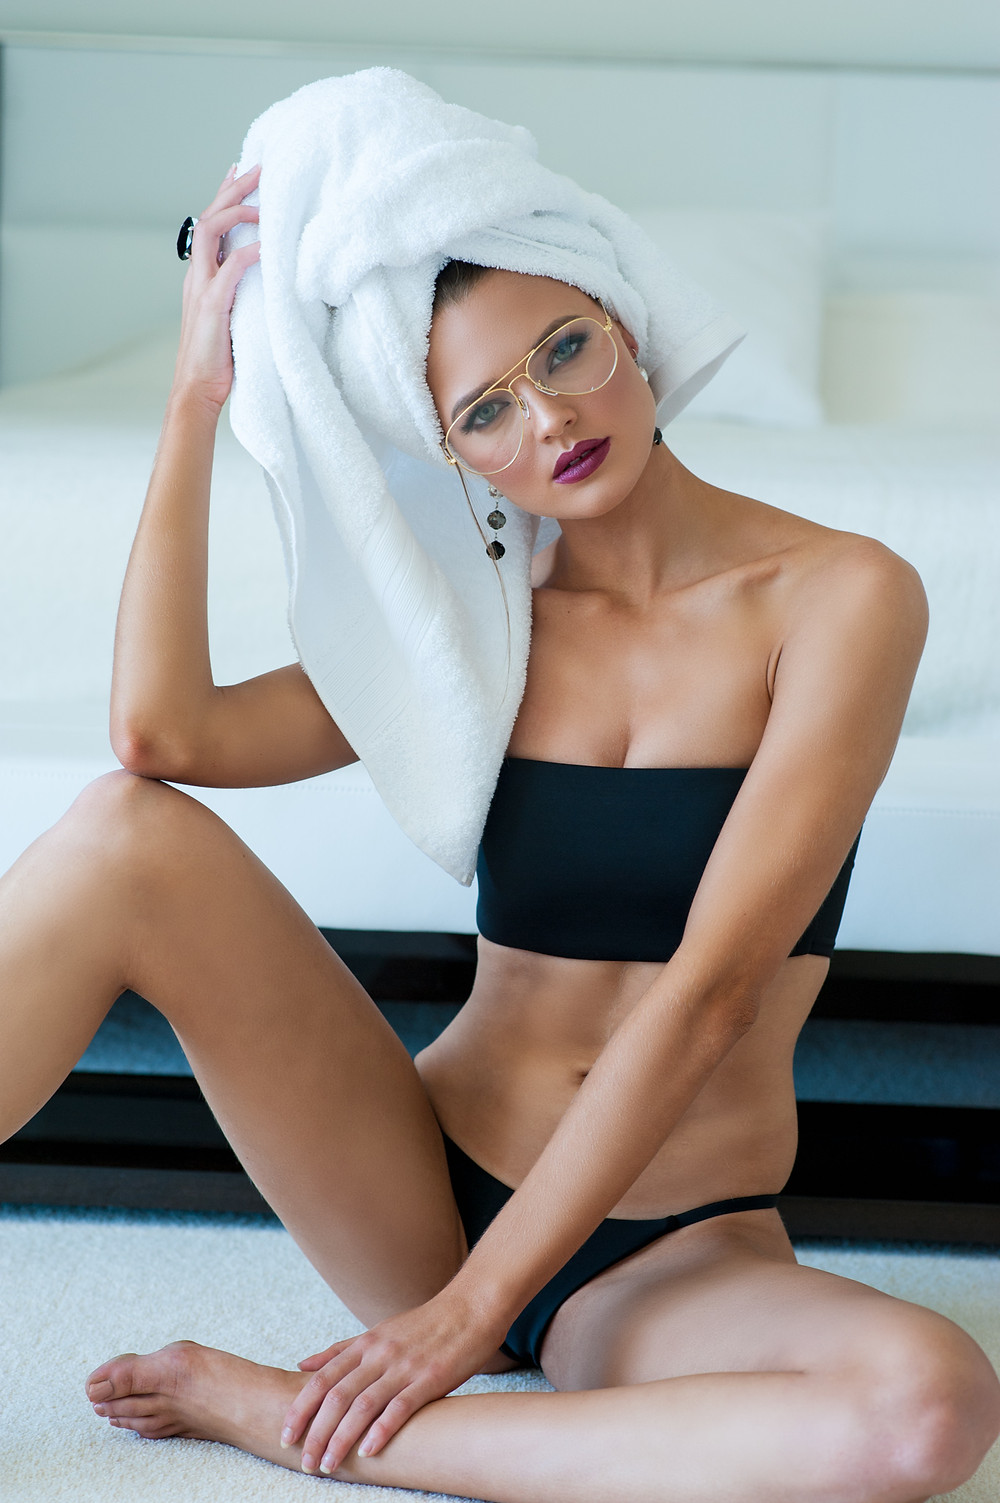 Jay Brosnan Photography | Sunshine Coast Photographer | Brisbane Photographer | Gold Coast Photographer | Swimwear Photographer | Summer Addiction Swimwear | Gold Coast | Gold Coast bikini | Bikini Babe | Bikini Model